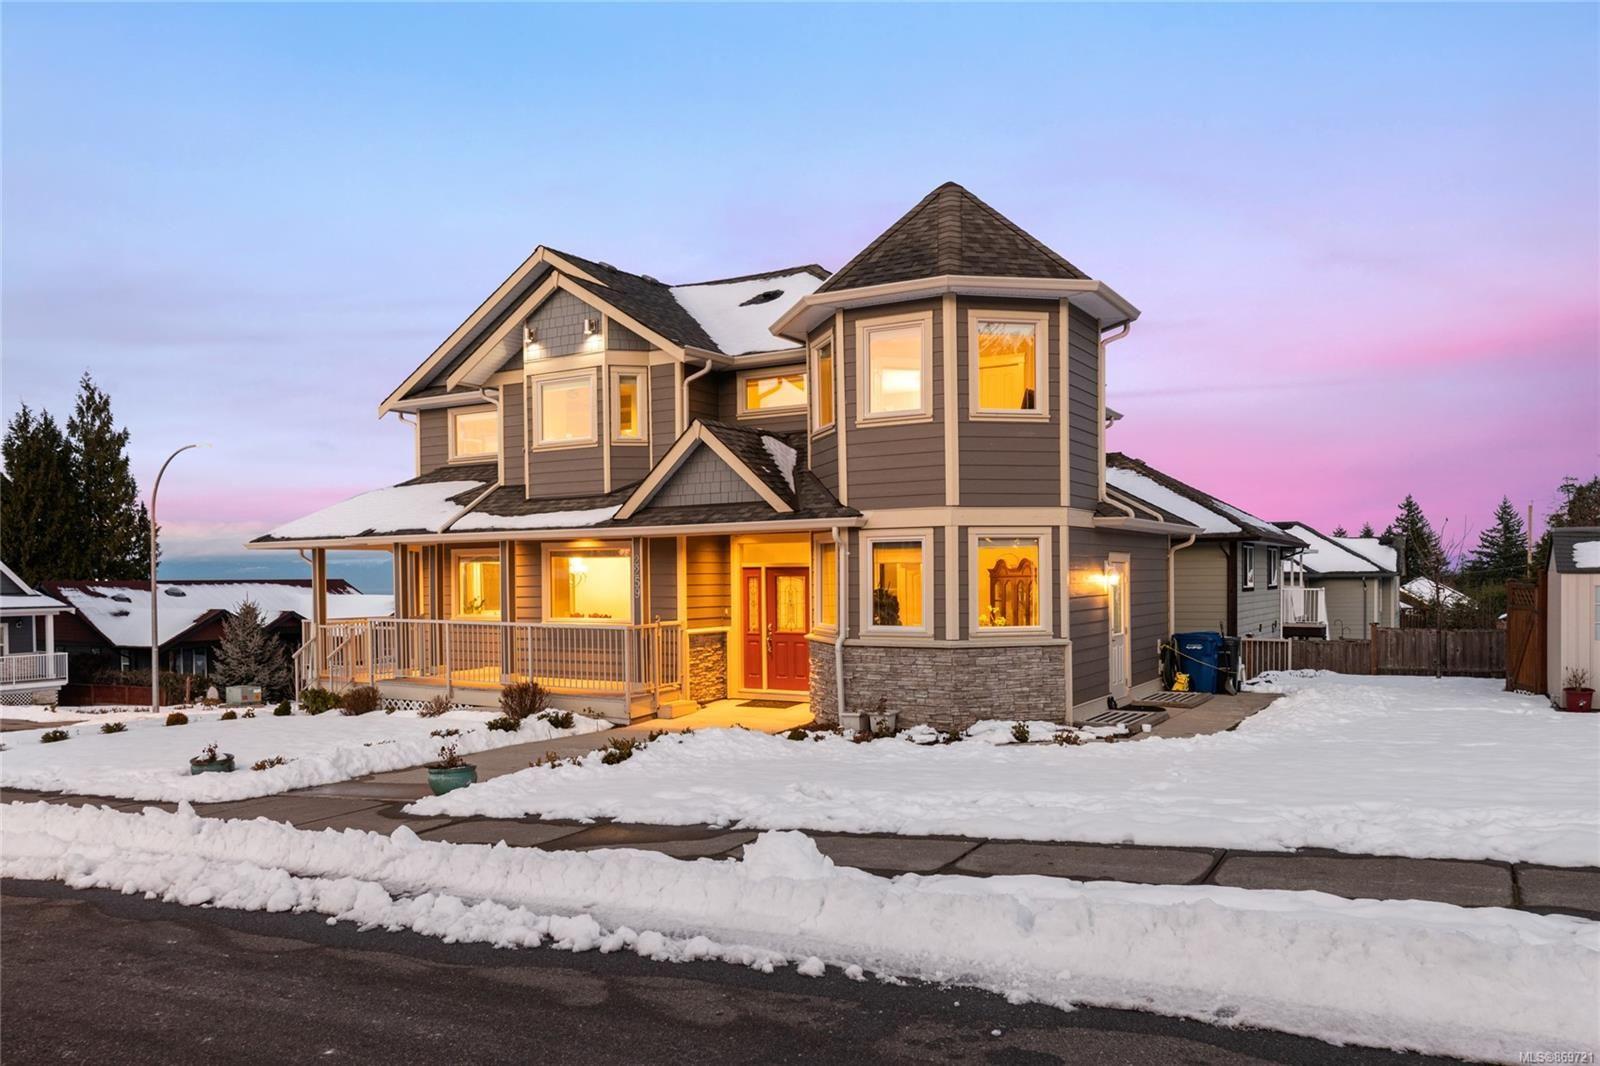 Photo 44: Photos: 2259 Leighton Rd in : Na South Jingle Pot House for sale (Nanaimo)  : MLS®# 869721